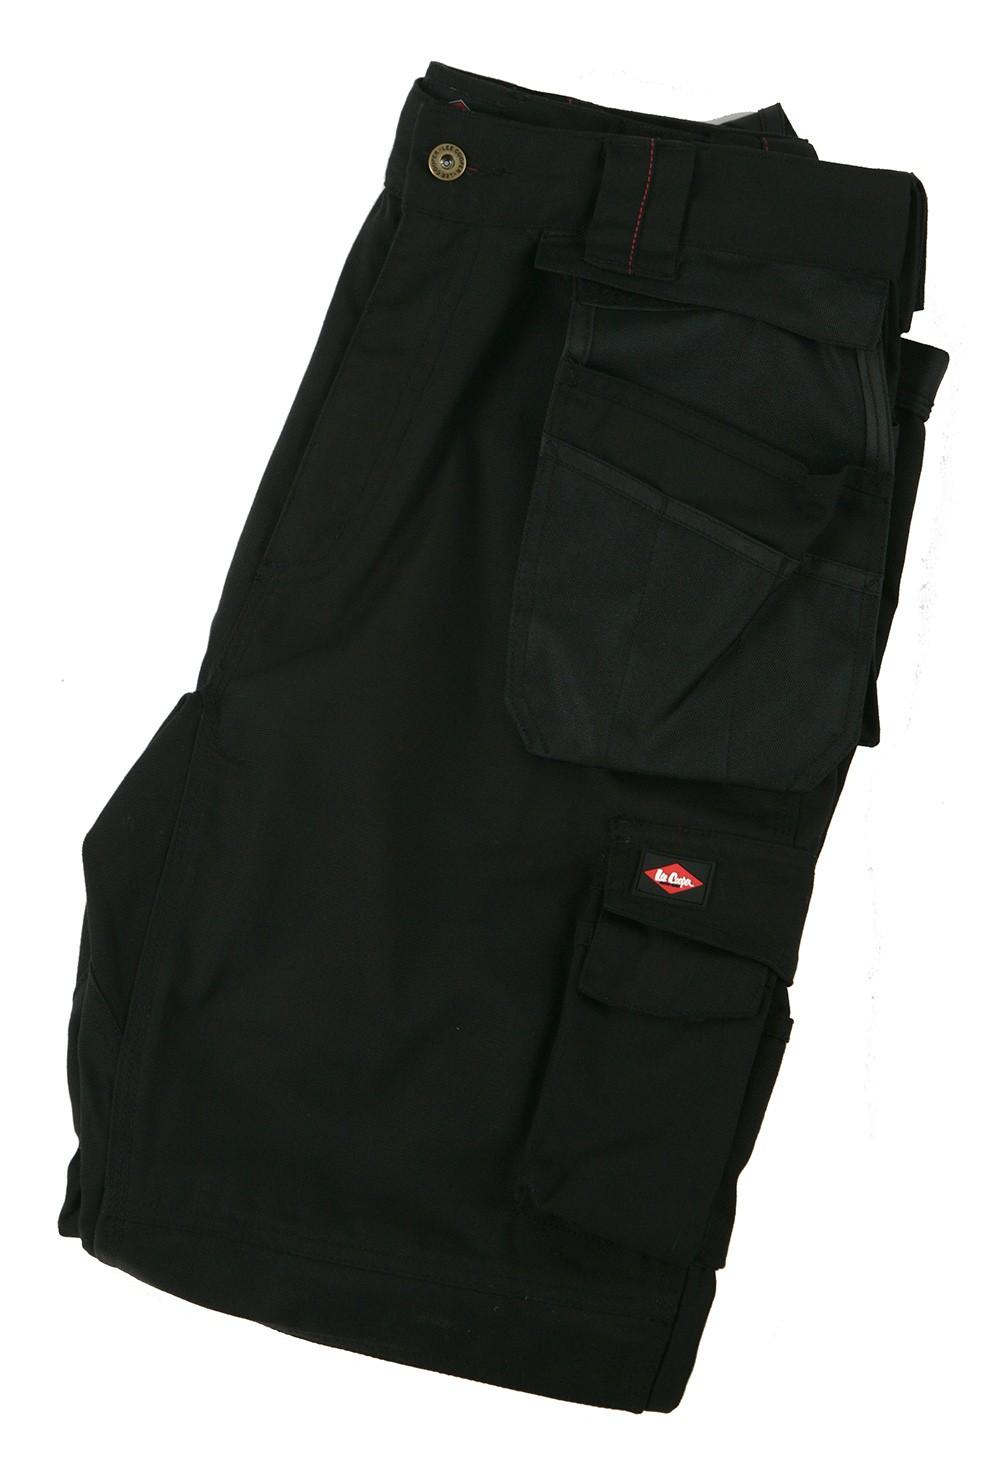 b700773a2e LCPNT210 CARGO TROUSER - Lee Cooper Workwear